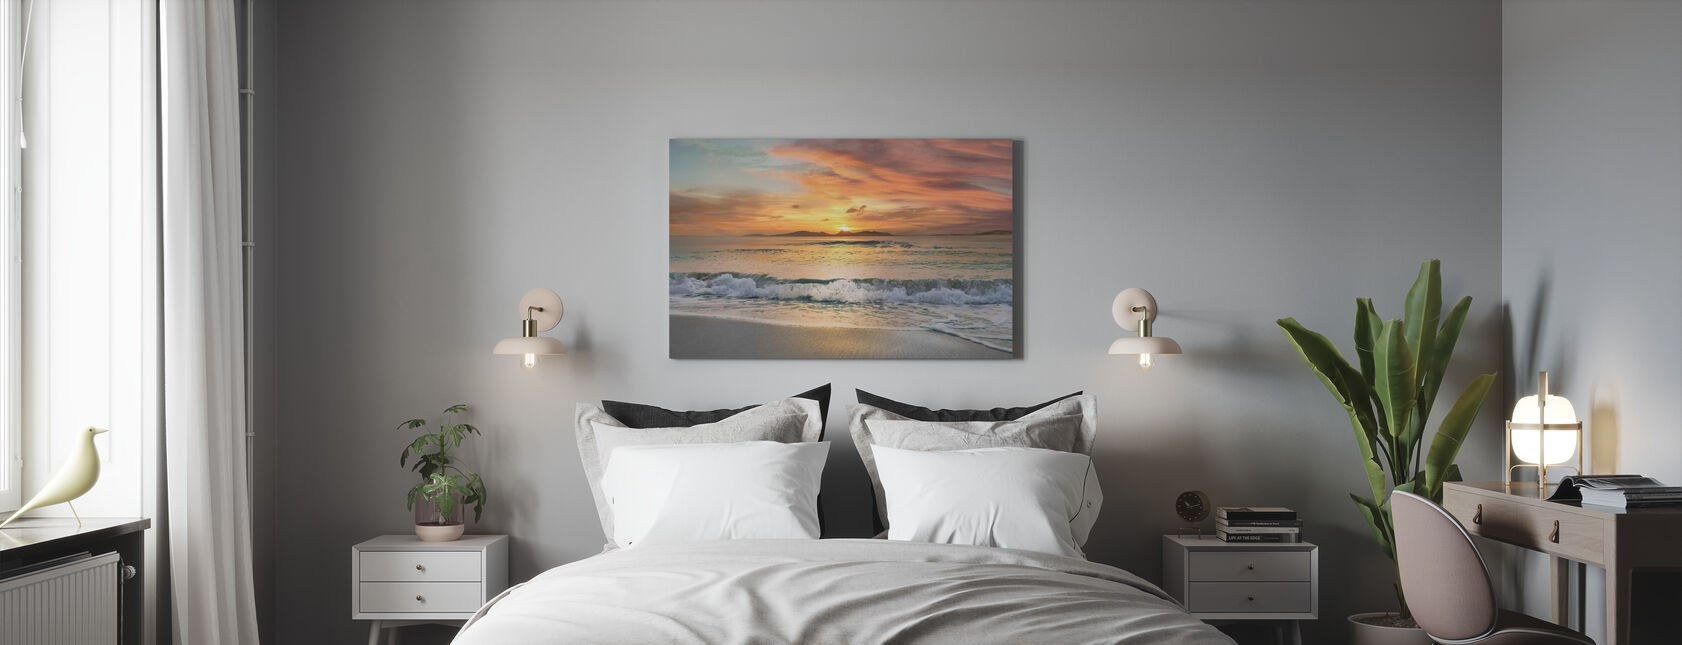 Sunset Beach - Canvas print - Bedroom